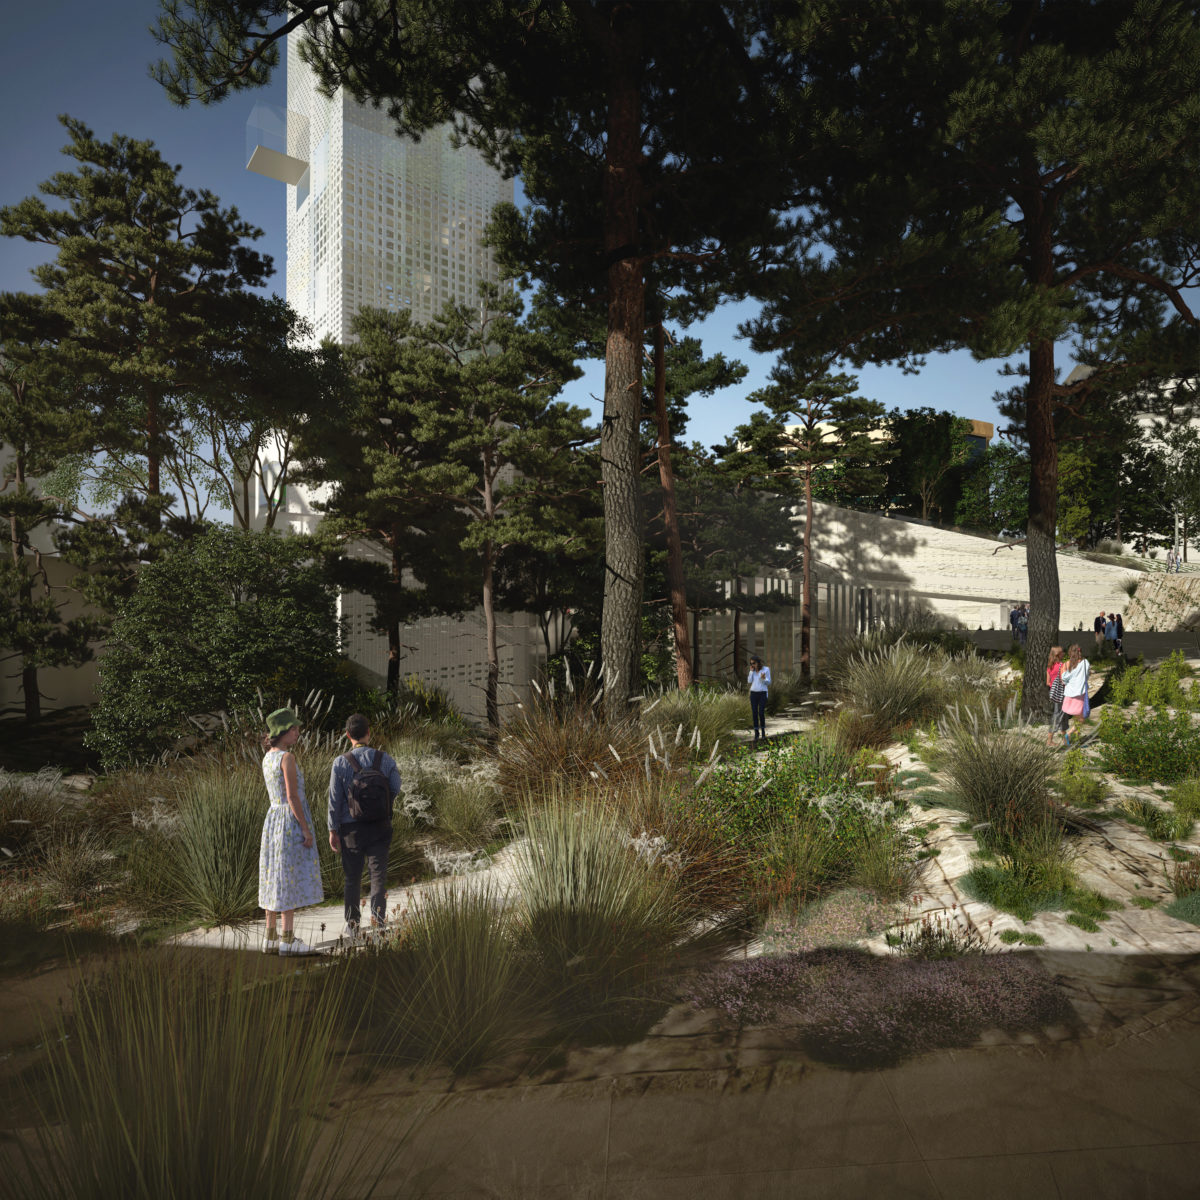 bema_perspective-garden-view_lowres